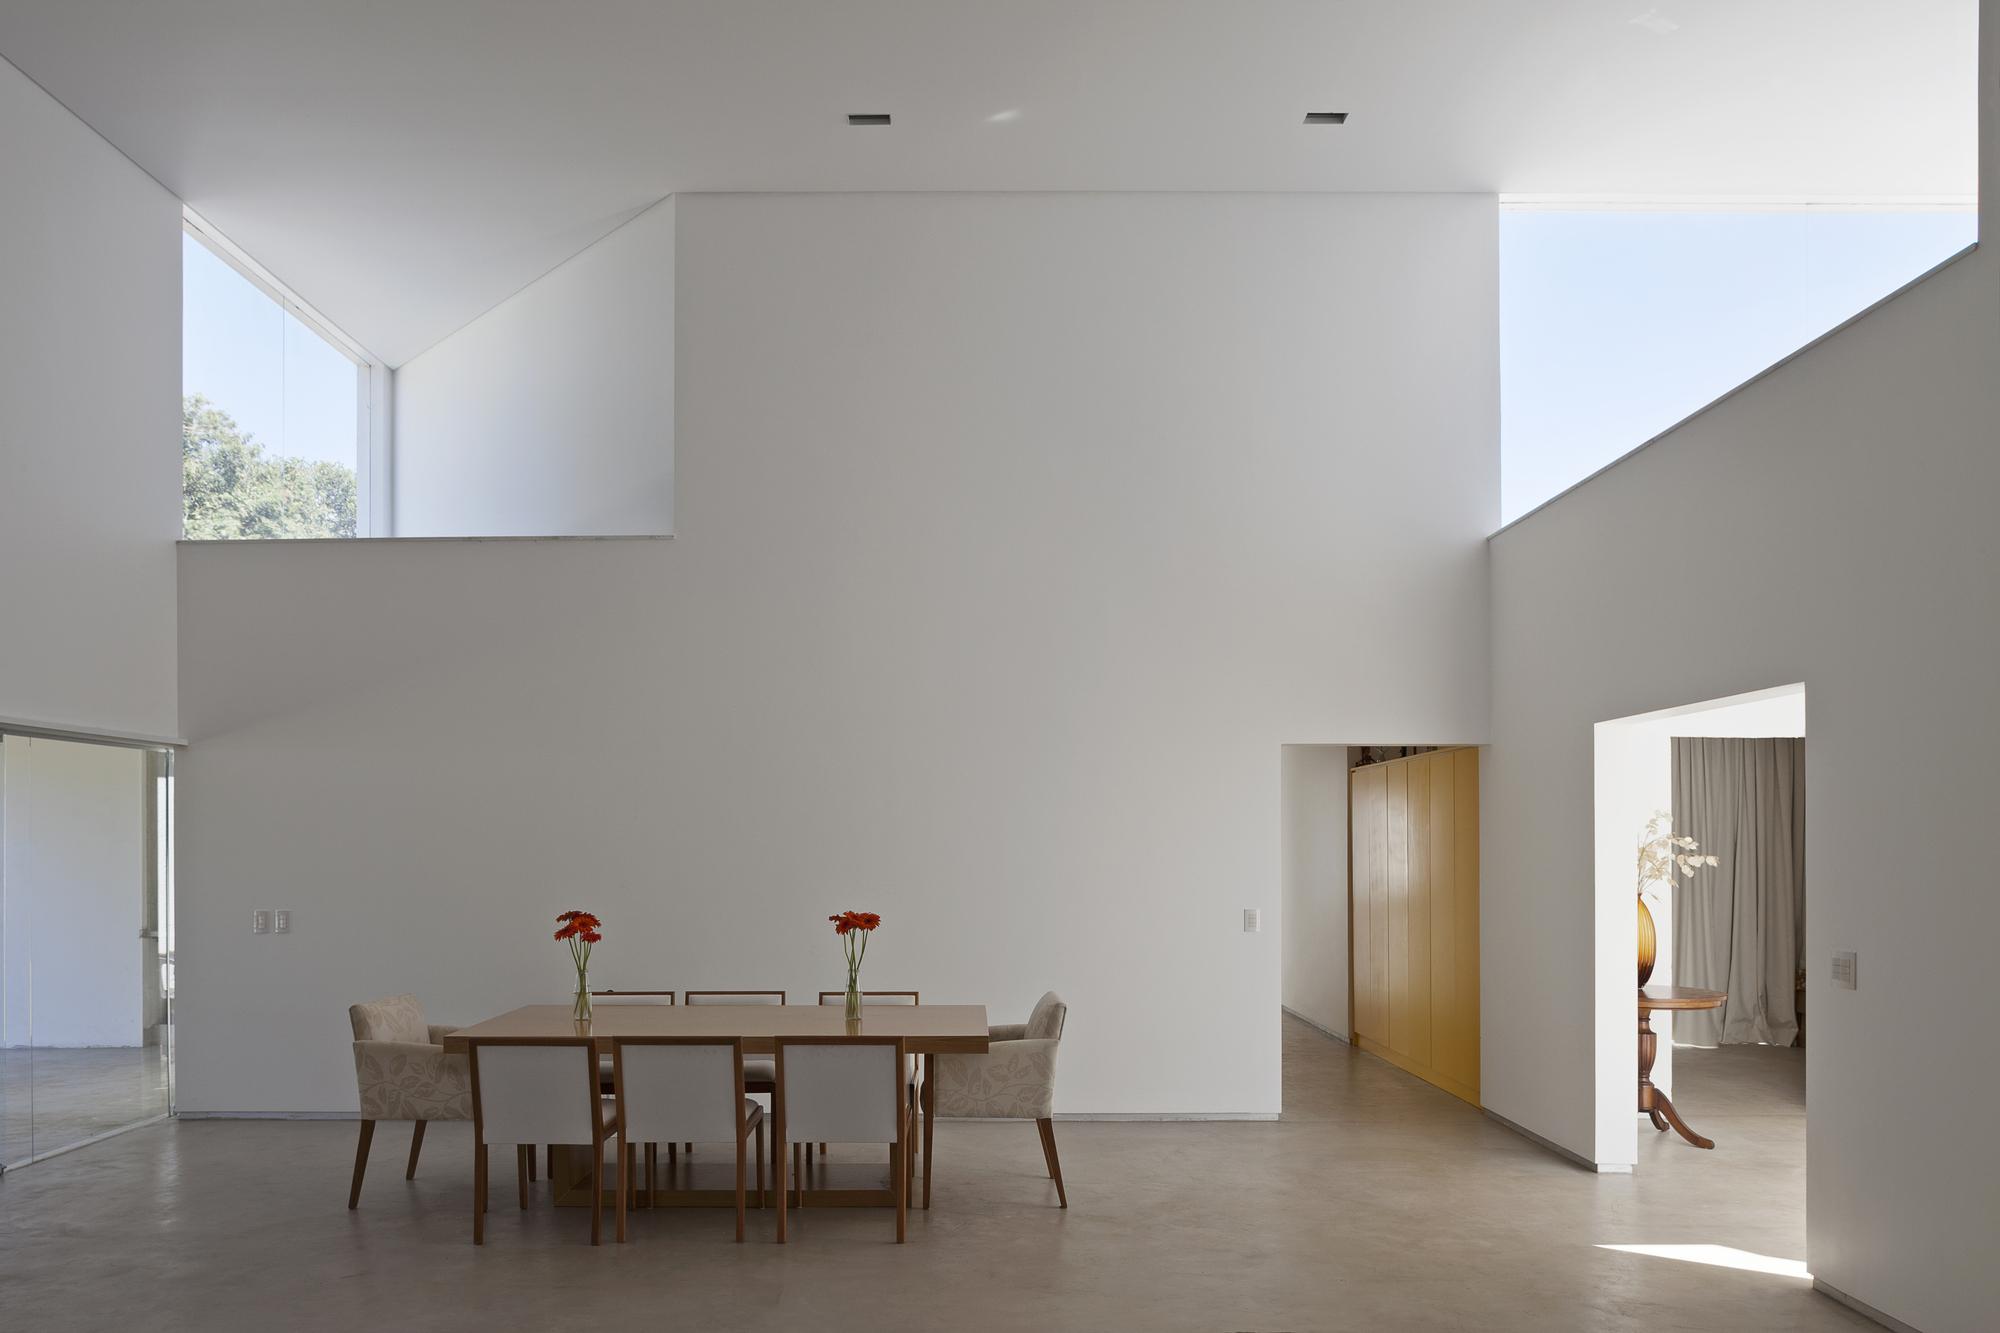 5226a145e8e44e03f4000117_migliari-guimar-es-house-domo-arquitetos__mg_1430_foto_haruo_mikami.jpg